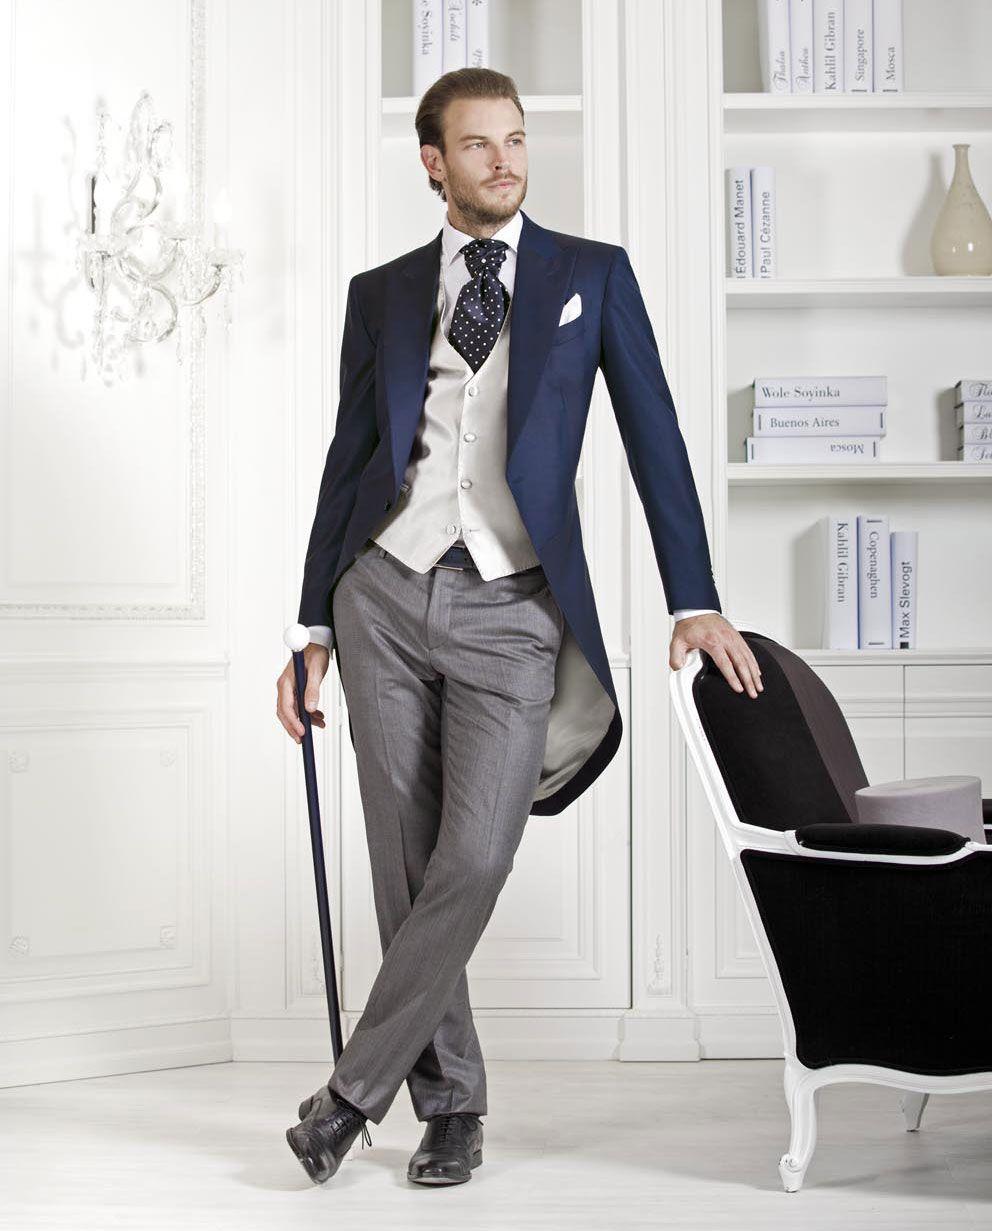 Tight - Abito da sposo | suit | Pinterest | Nice suits, Morning ...